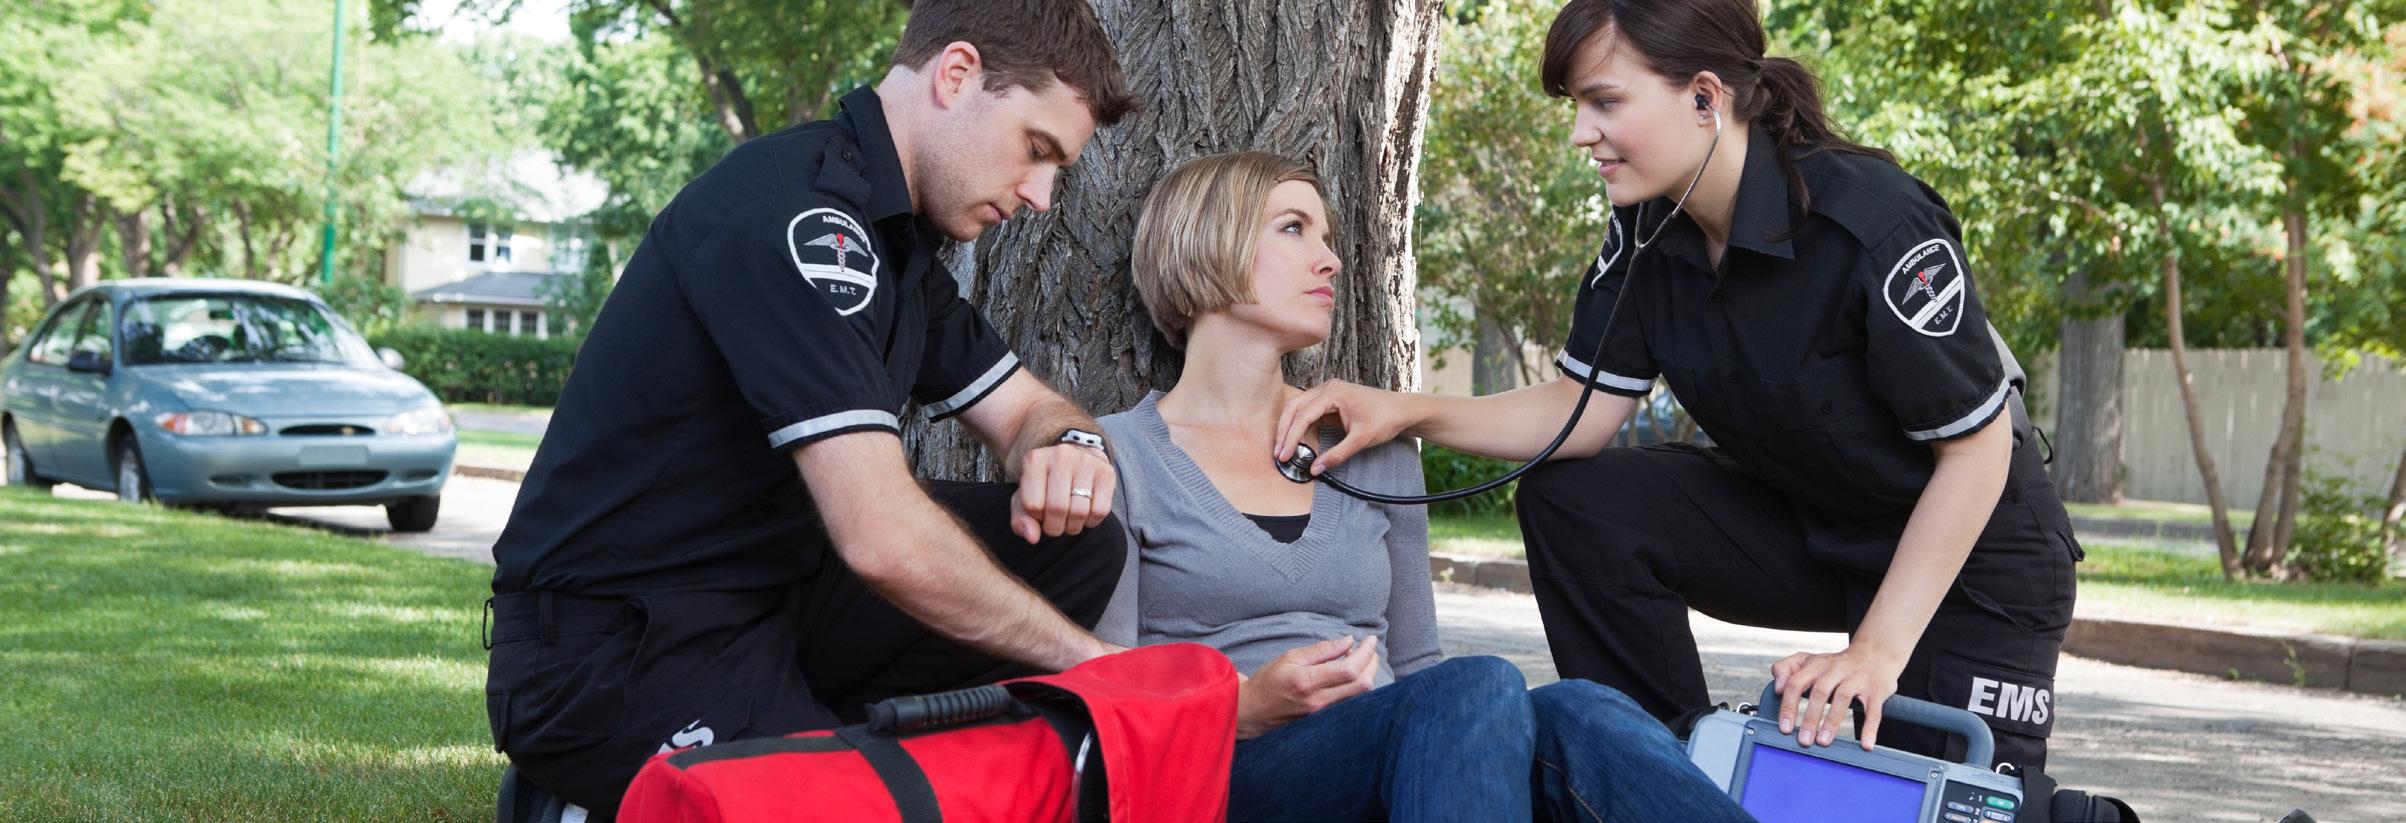 Emergency Medical Responder Image